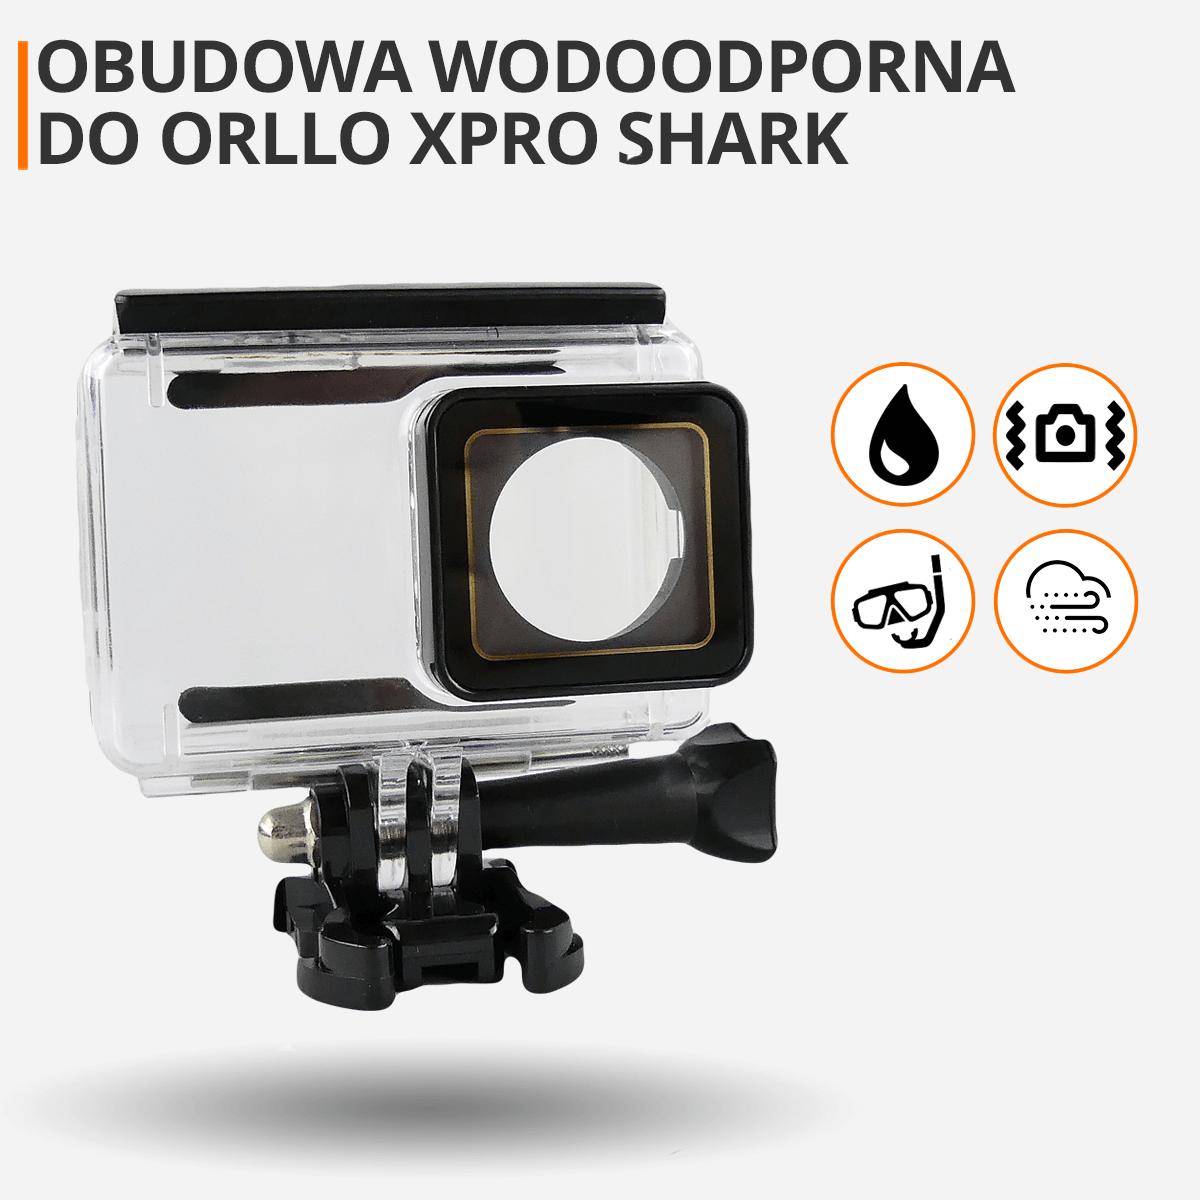 obudowa-wodoodporna-do-kamery-sportowej-xpro-shark-orllo-pl